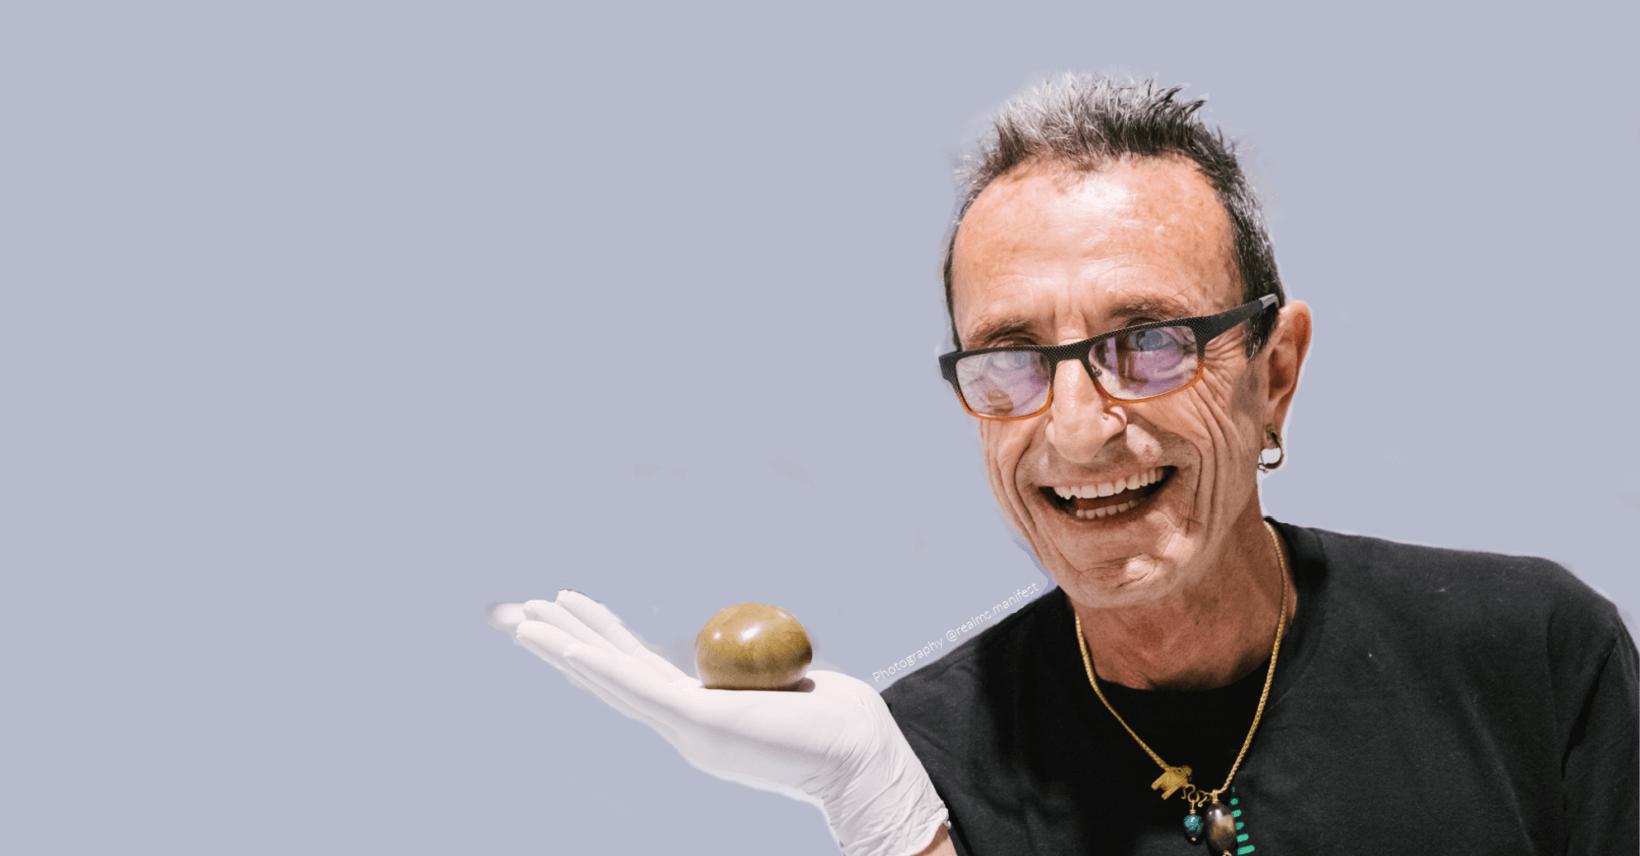 Muere Frenchy Cannoli, leyenda del hachís